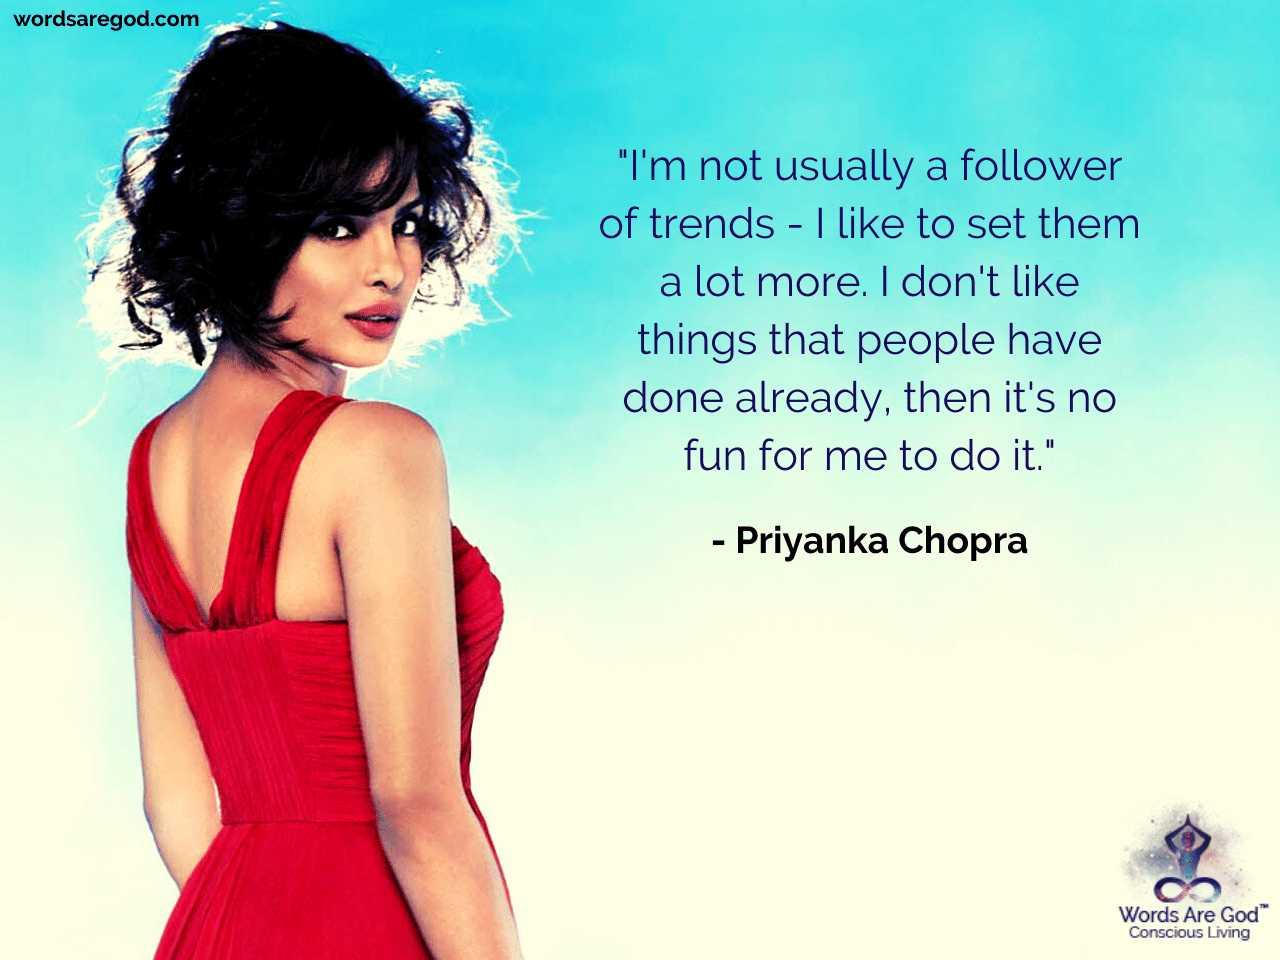 Priyanka Chopra Best Quote by Priyanka Chopra